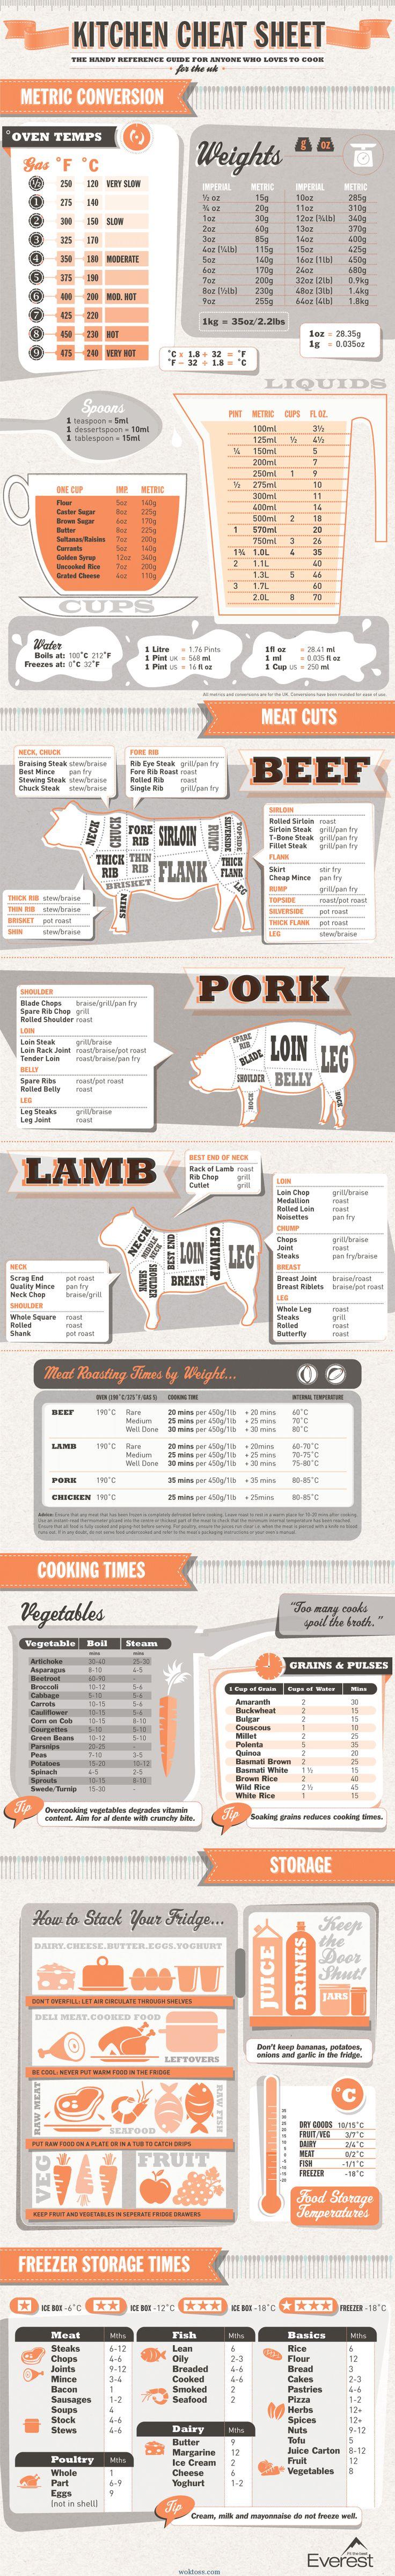 printable kitchen cheat sheet.. :-)